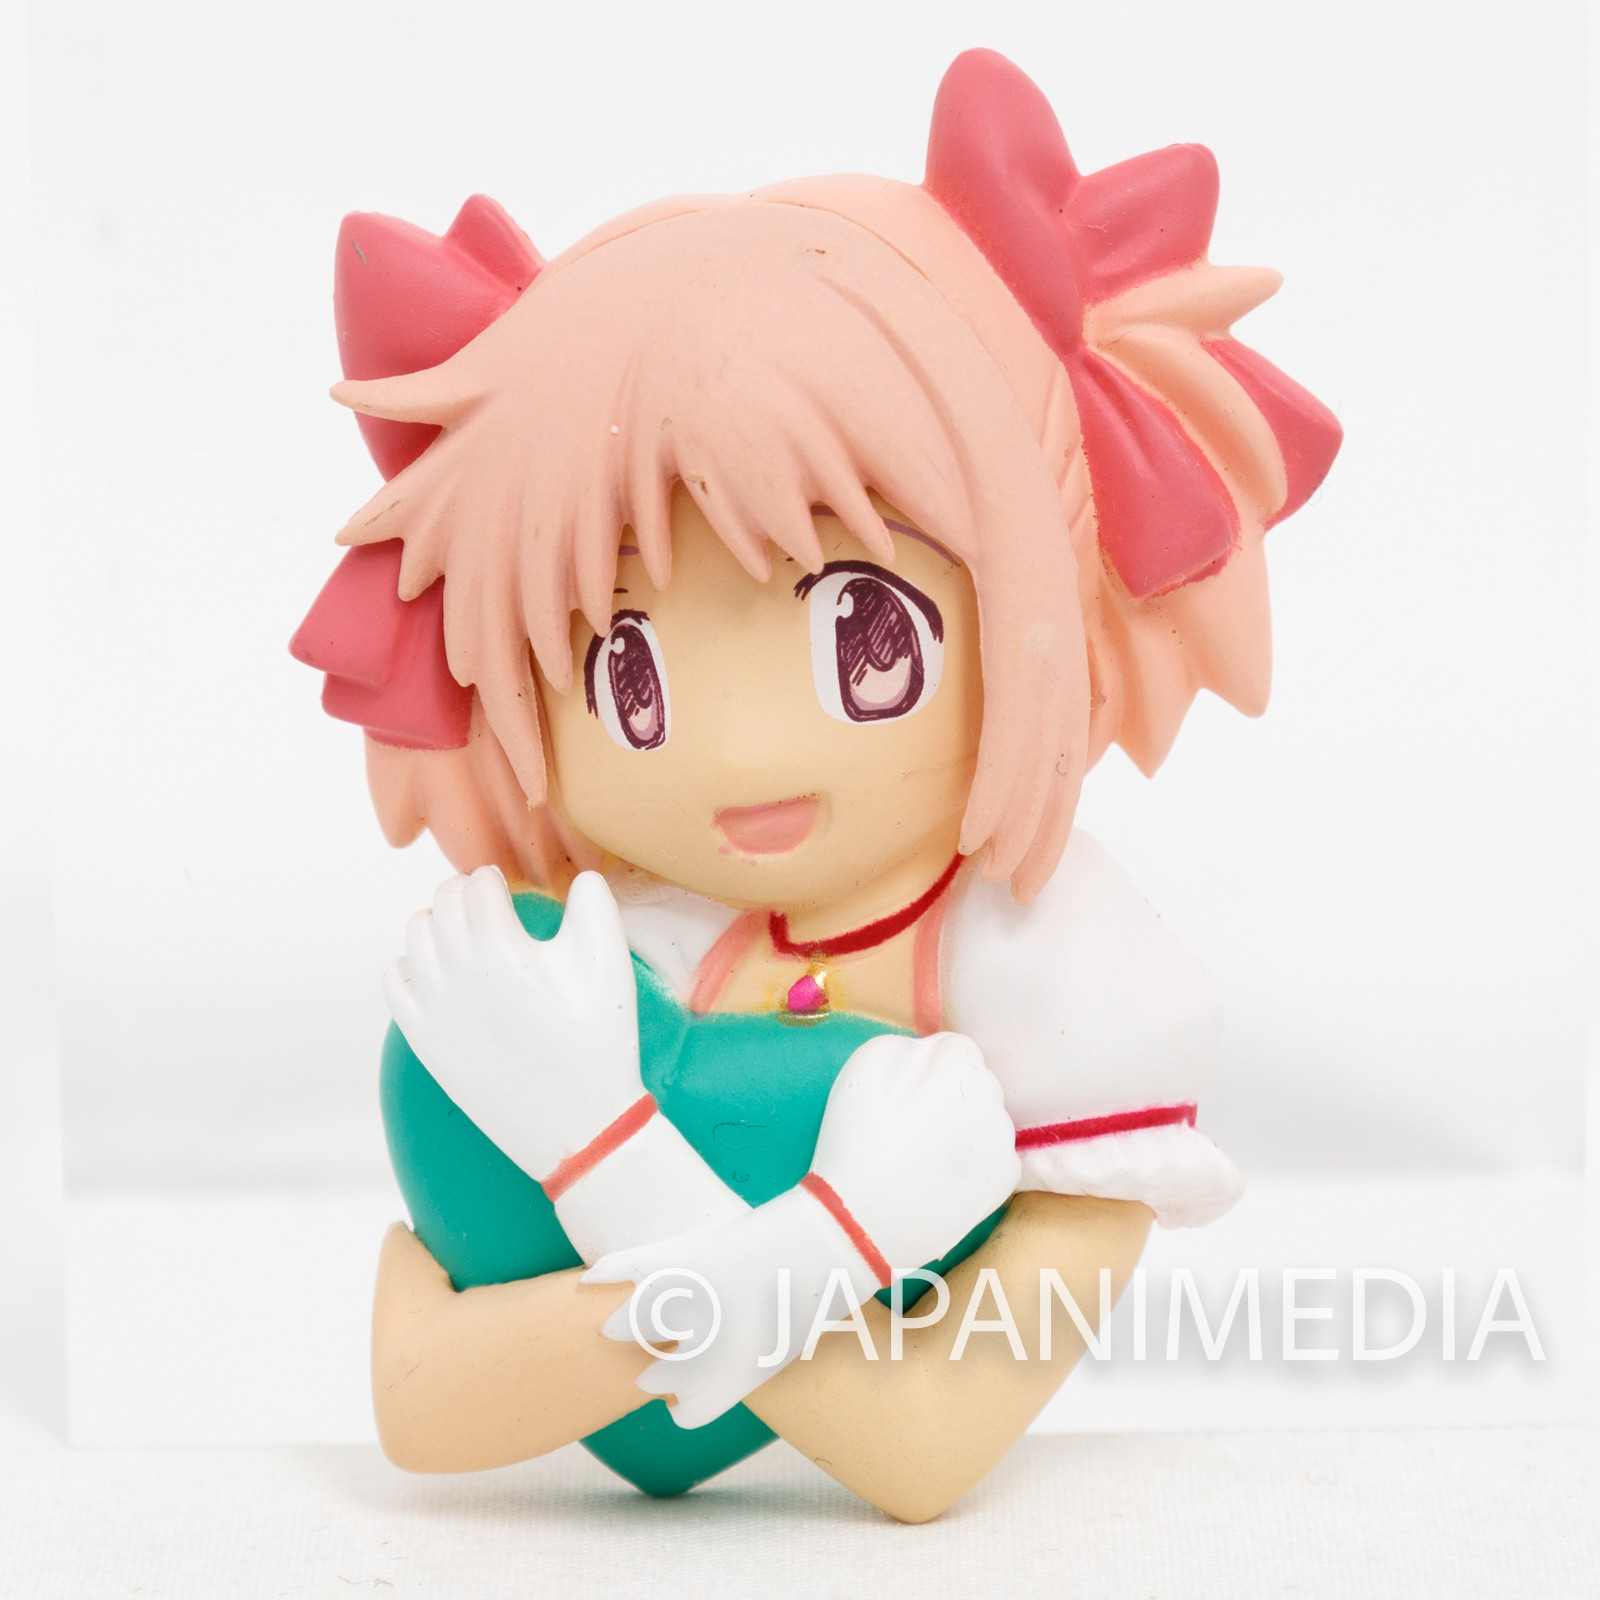 Puella Magi Madoka Kaname Madoka Relief Mascot Magnet Takara Tomy JAPAN ANIME